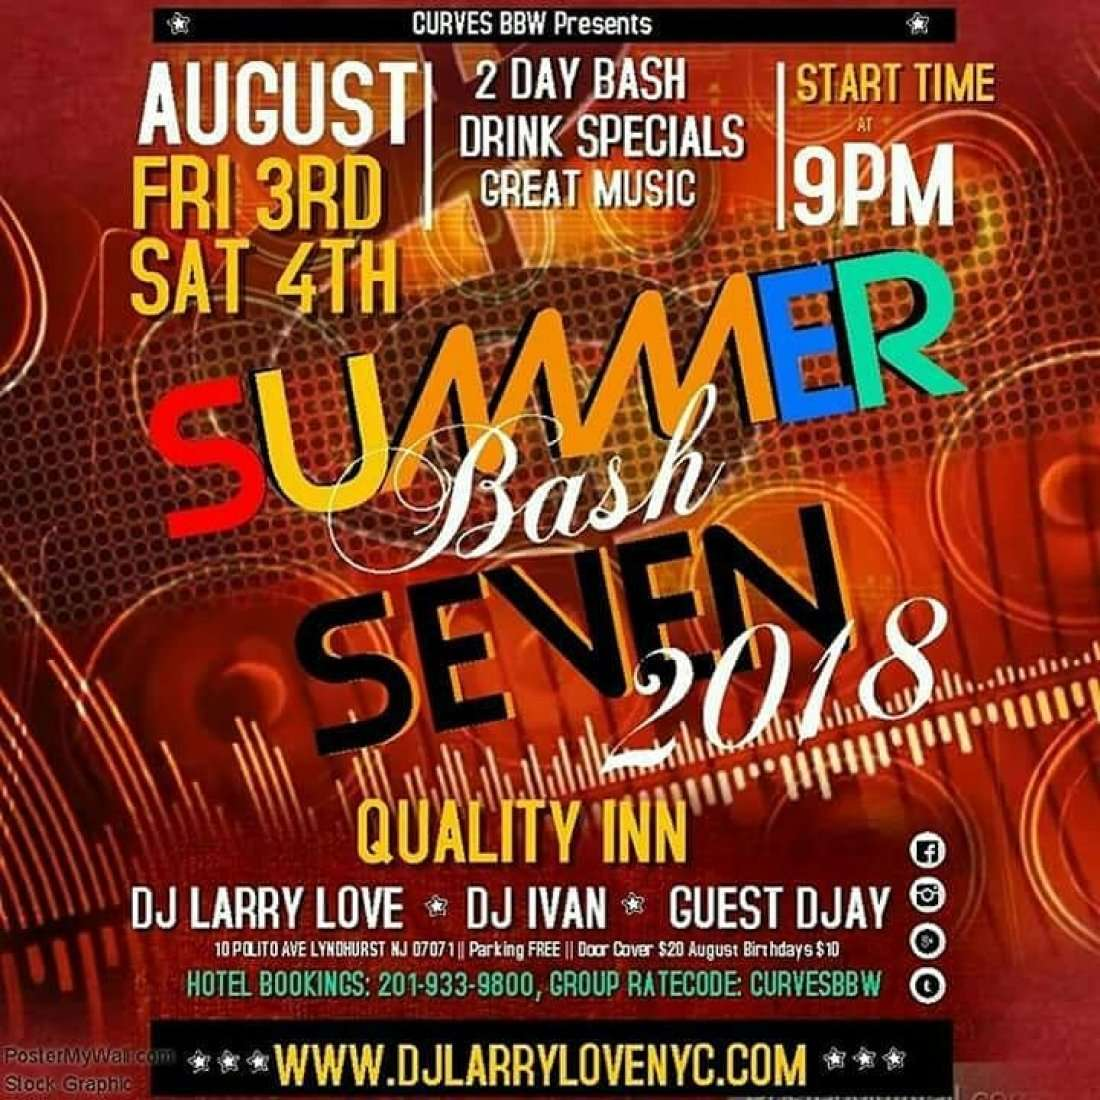 Curves BBW Presents Summer Bash 7